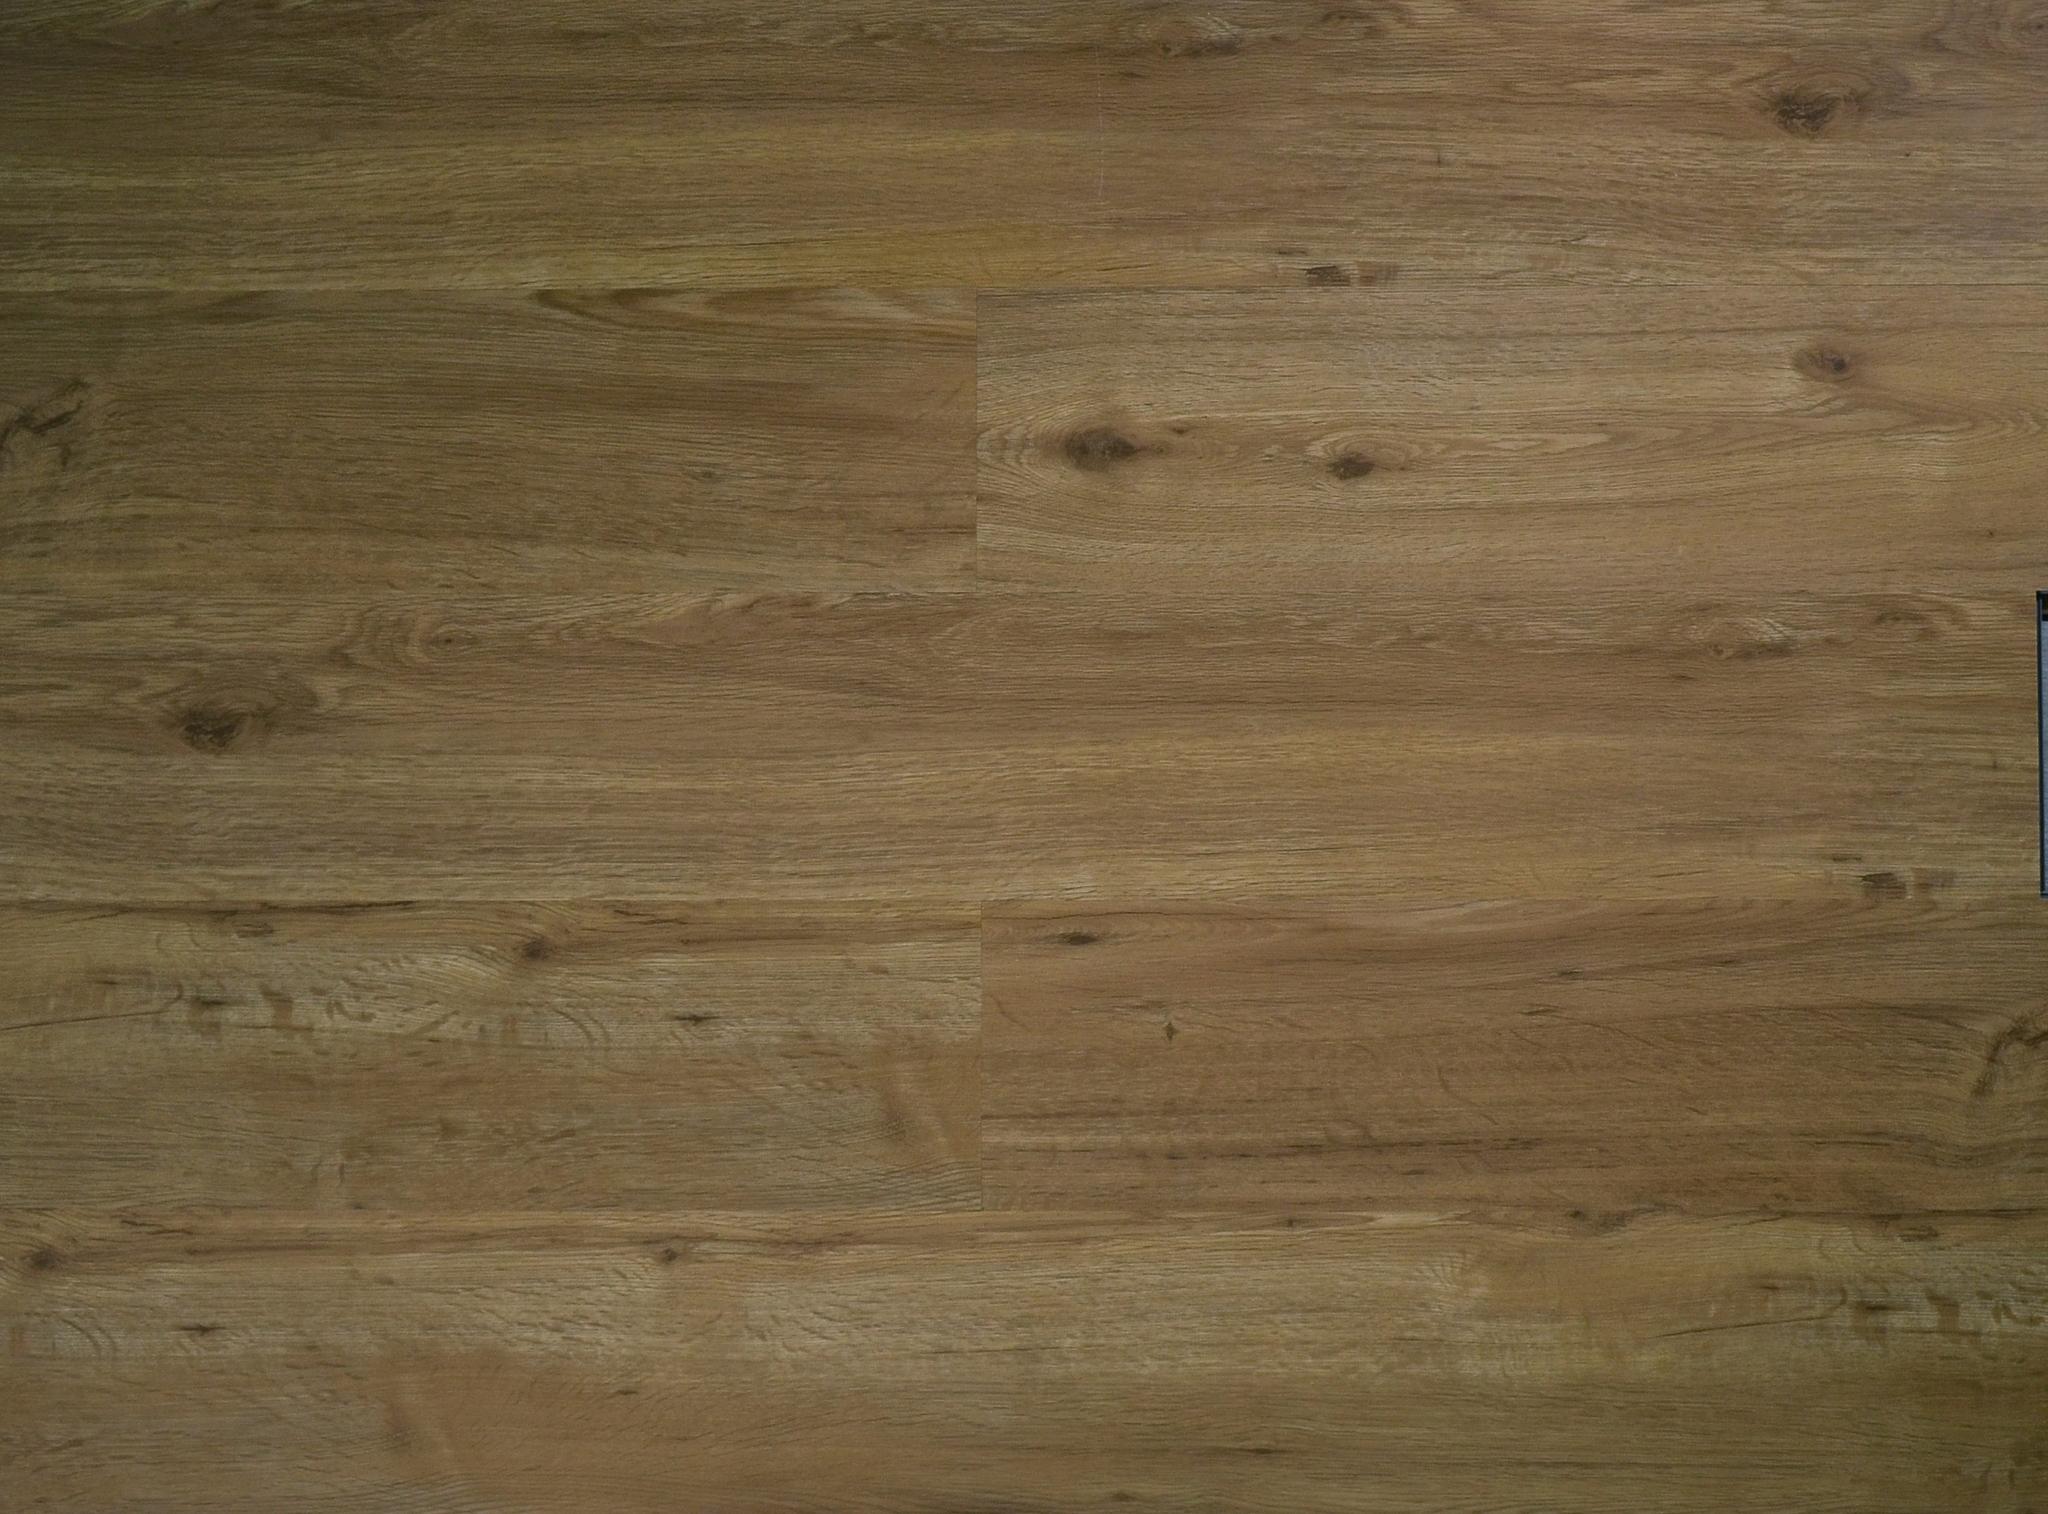 Виниловый пол Concept Floor - Fit Line Eiche Provence (Дуб Provence)